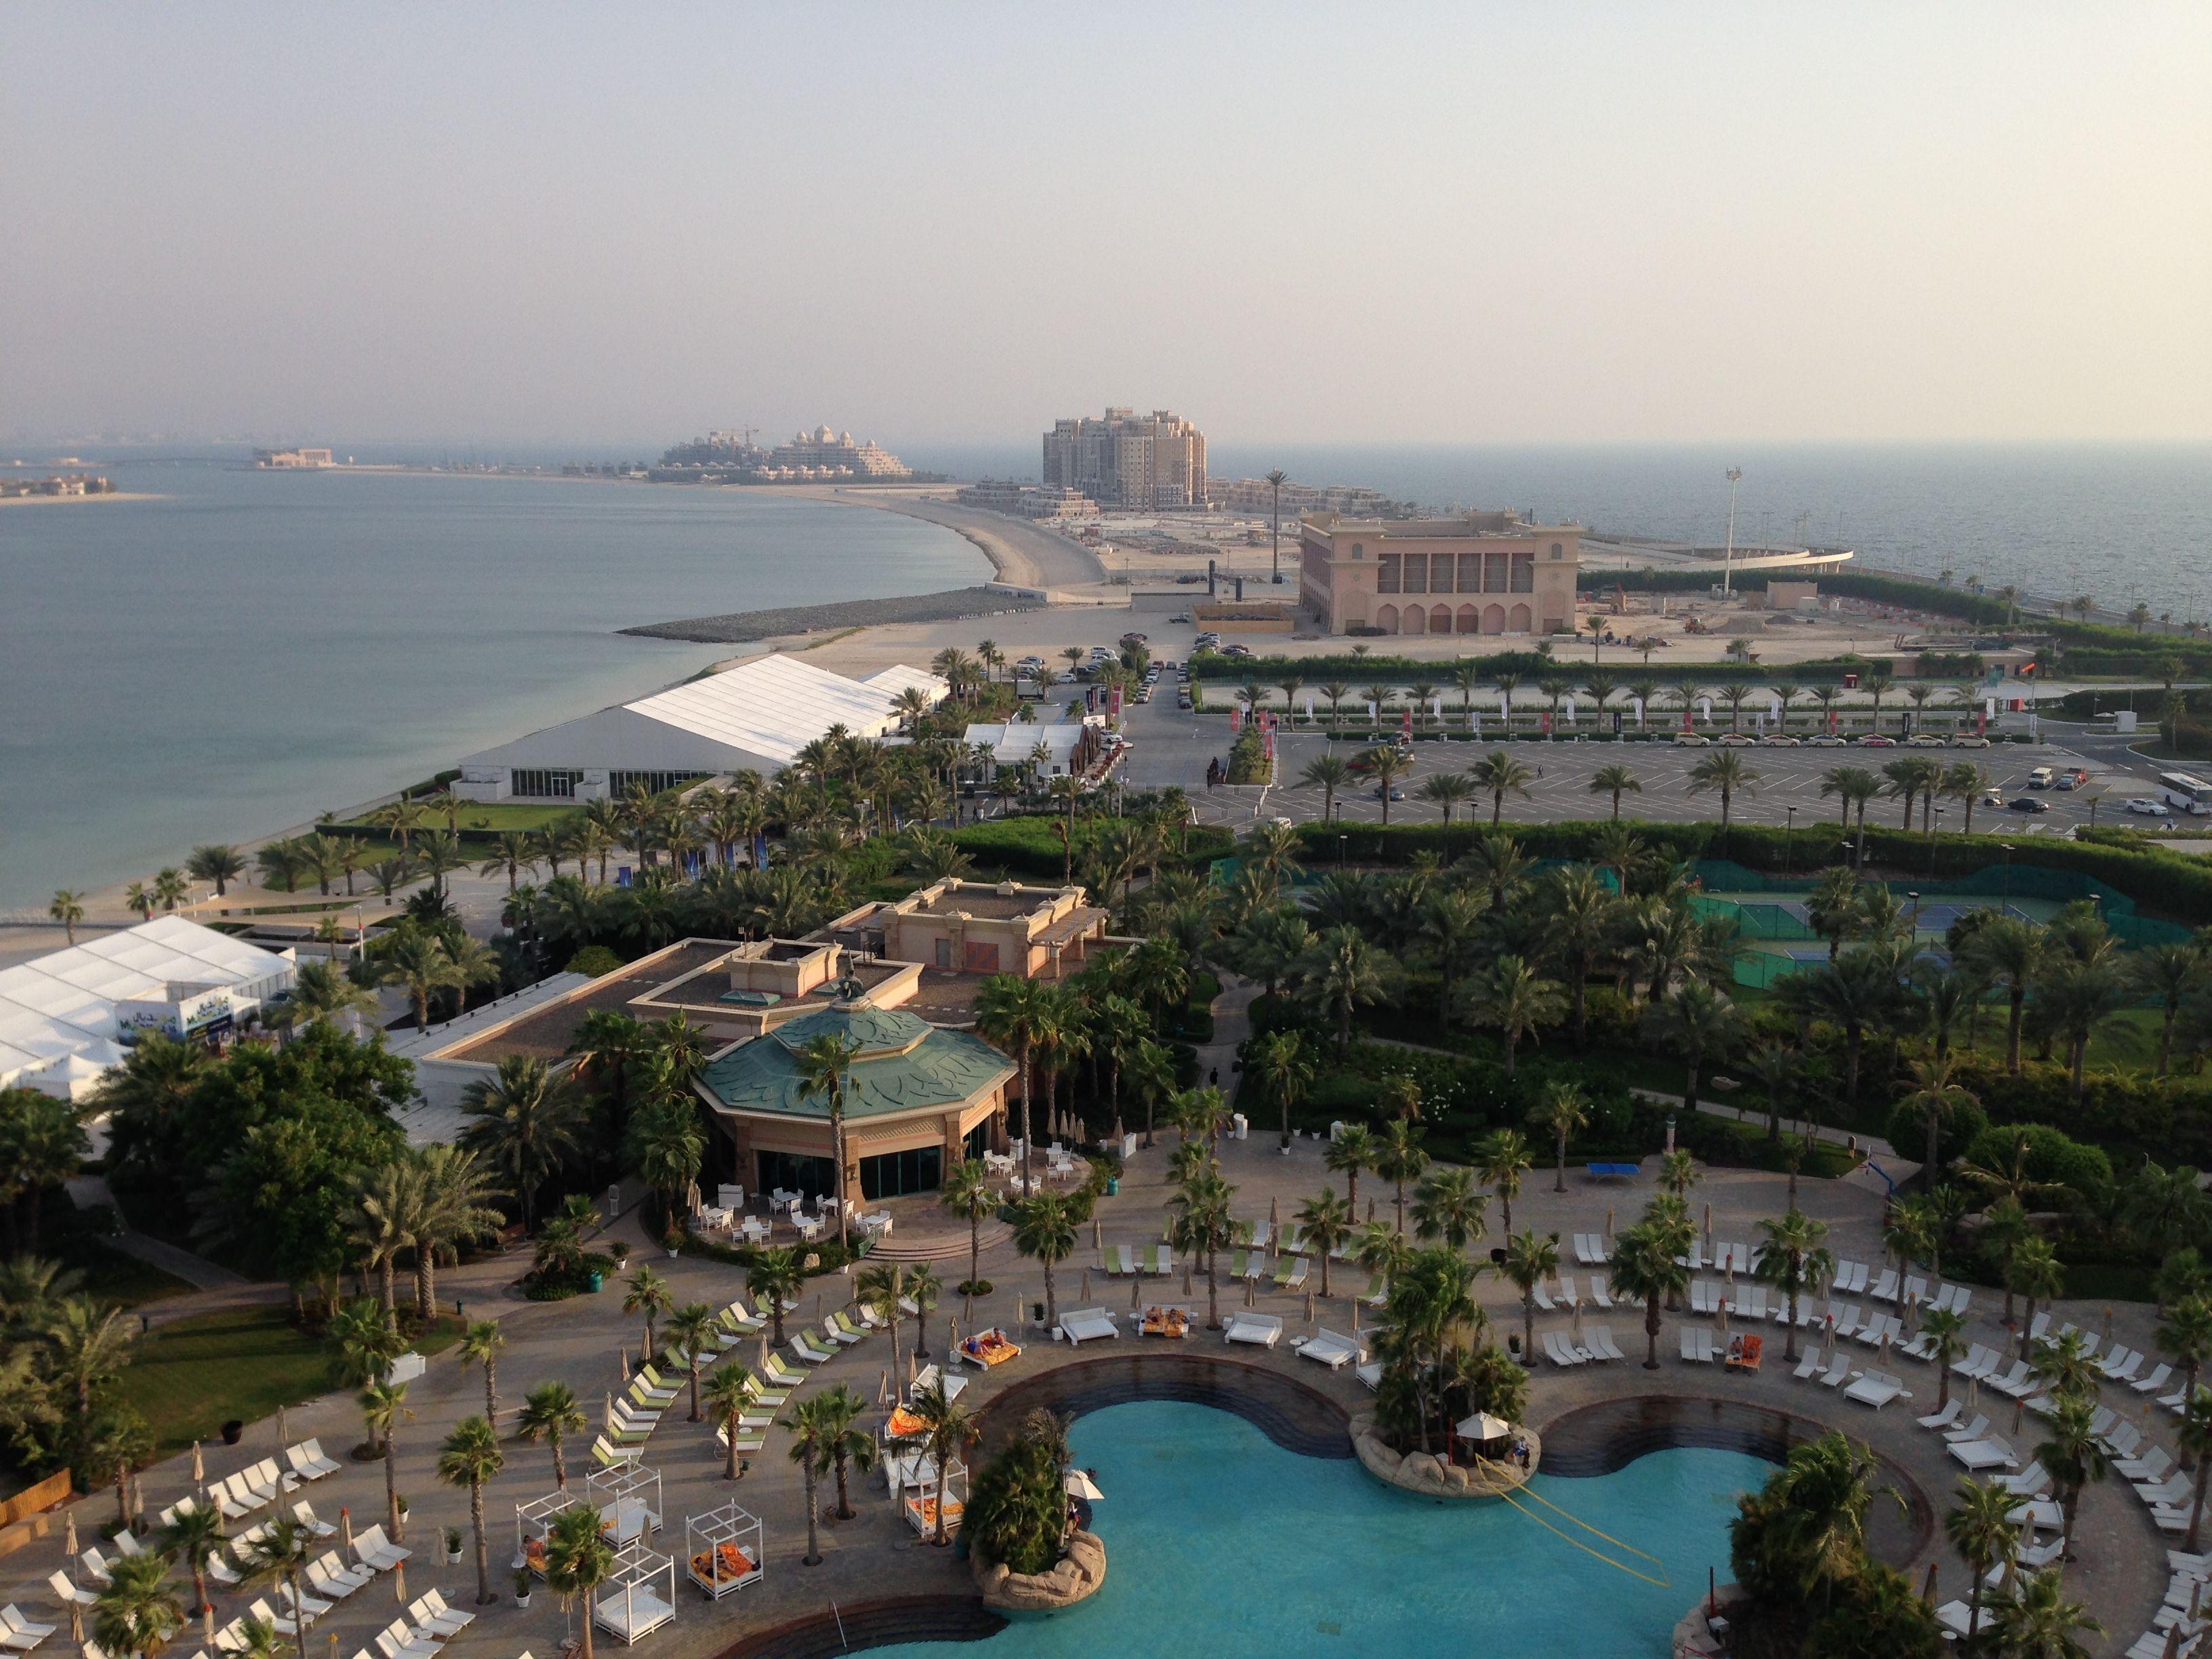 View from room at the atlantis Palm resort Dubai